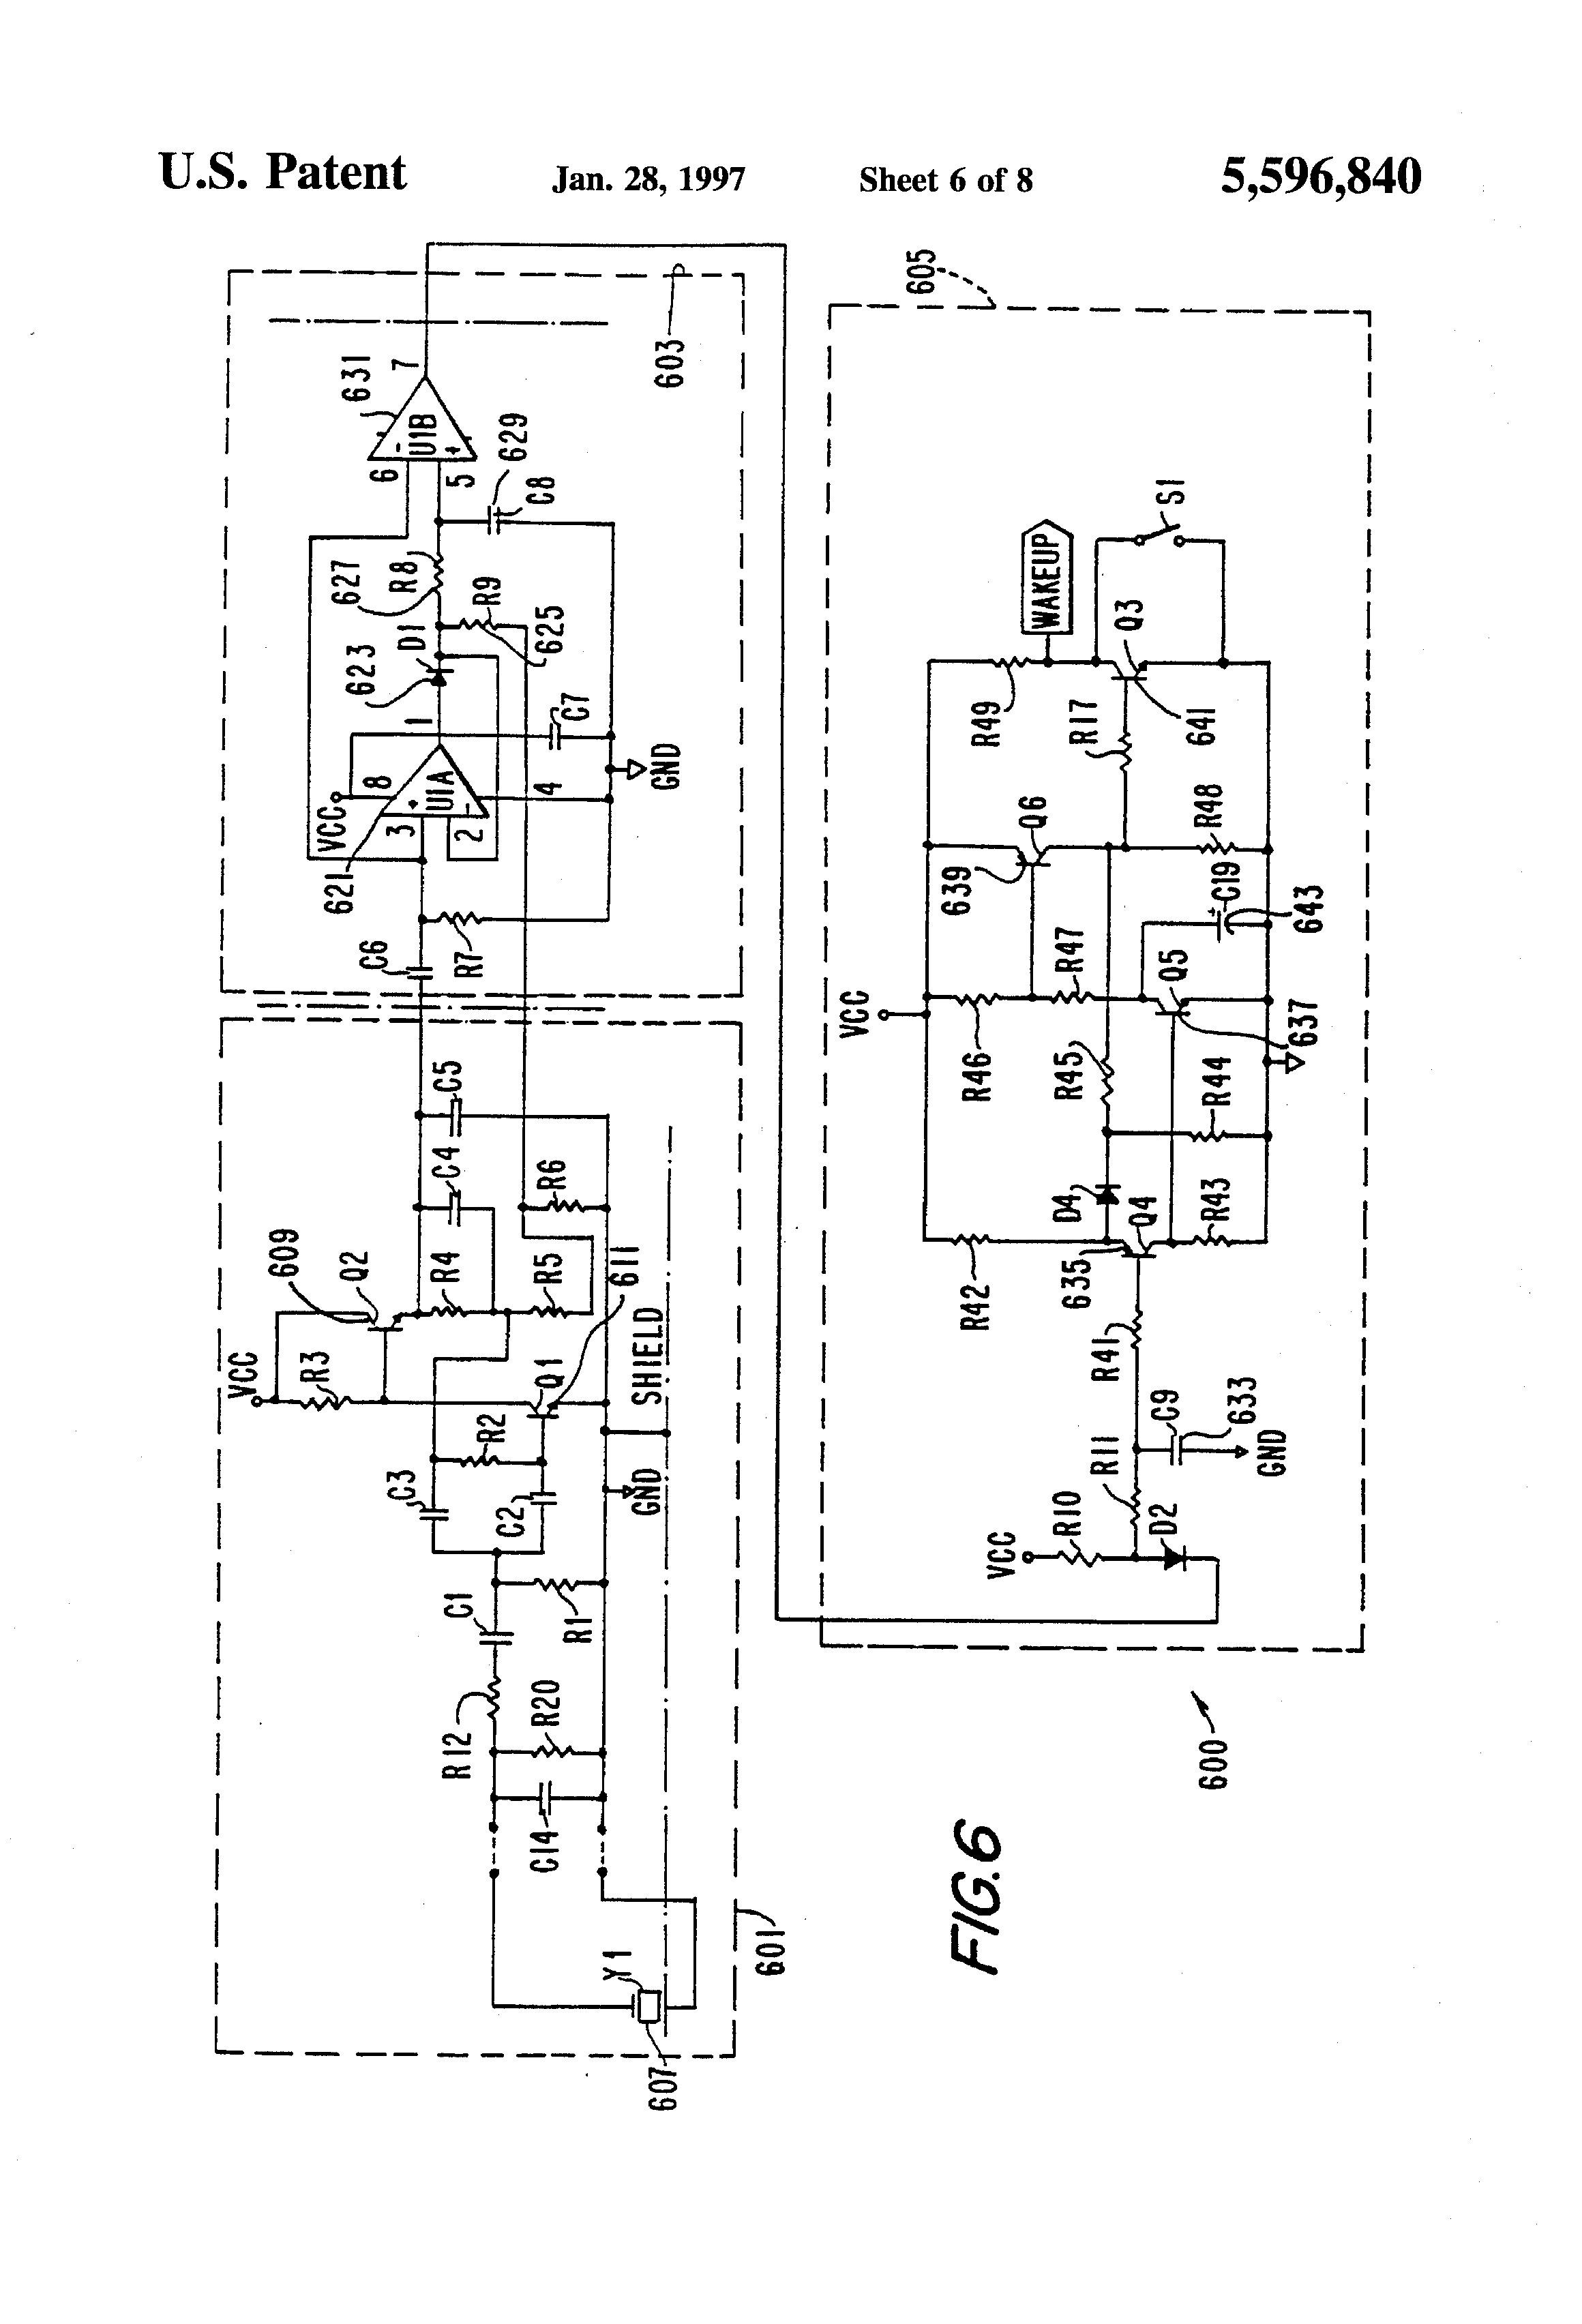 Genie Garage Door Sensor Wiring Diagram Free Picture | Manual E-Books - Genie Garage Door Sensor Wiring Diagram